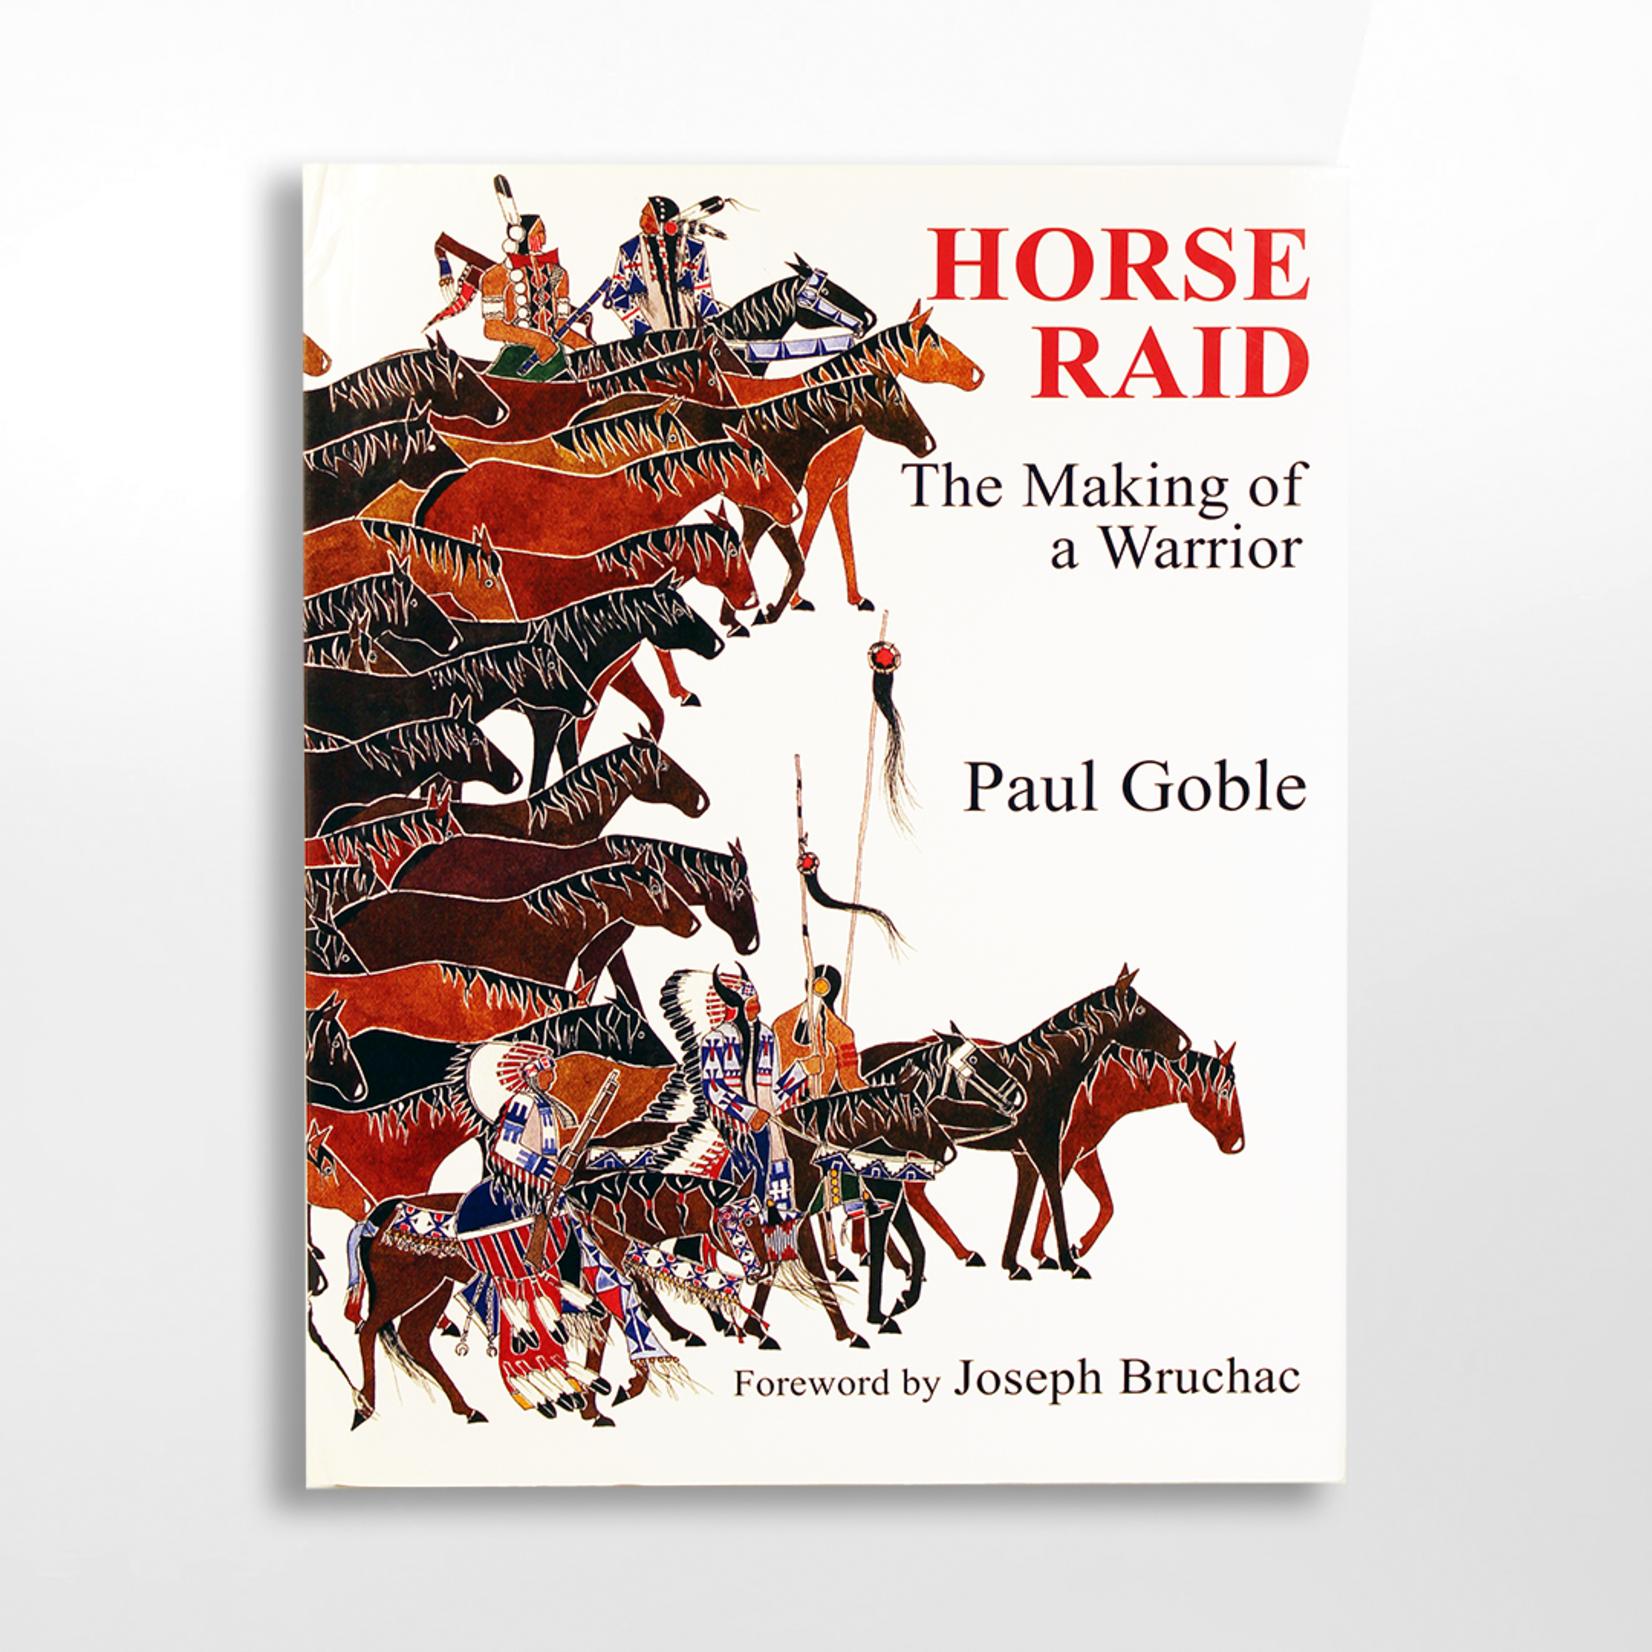 Dakota West Books Horse Raid, The Making of a Warrior